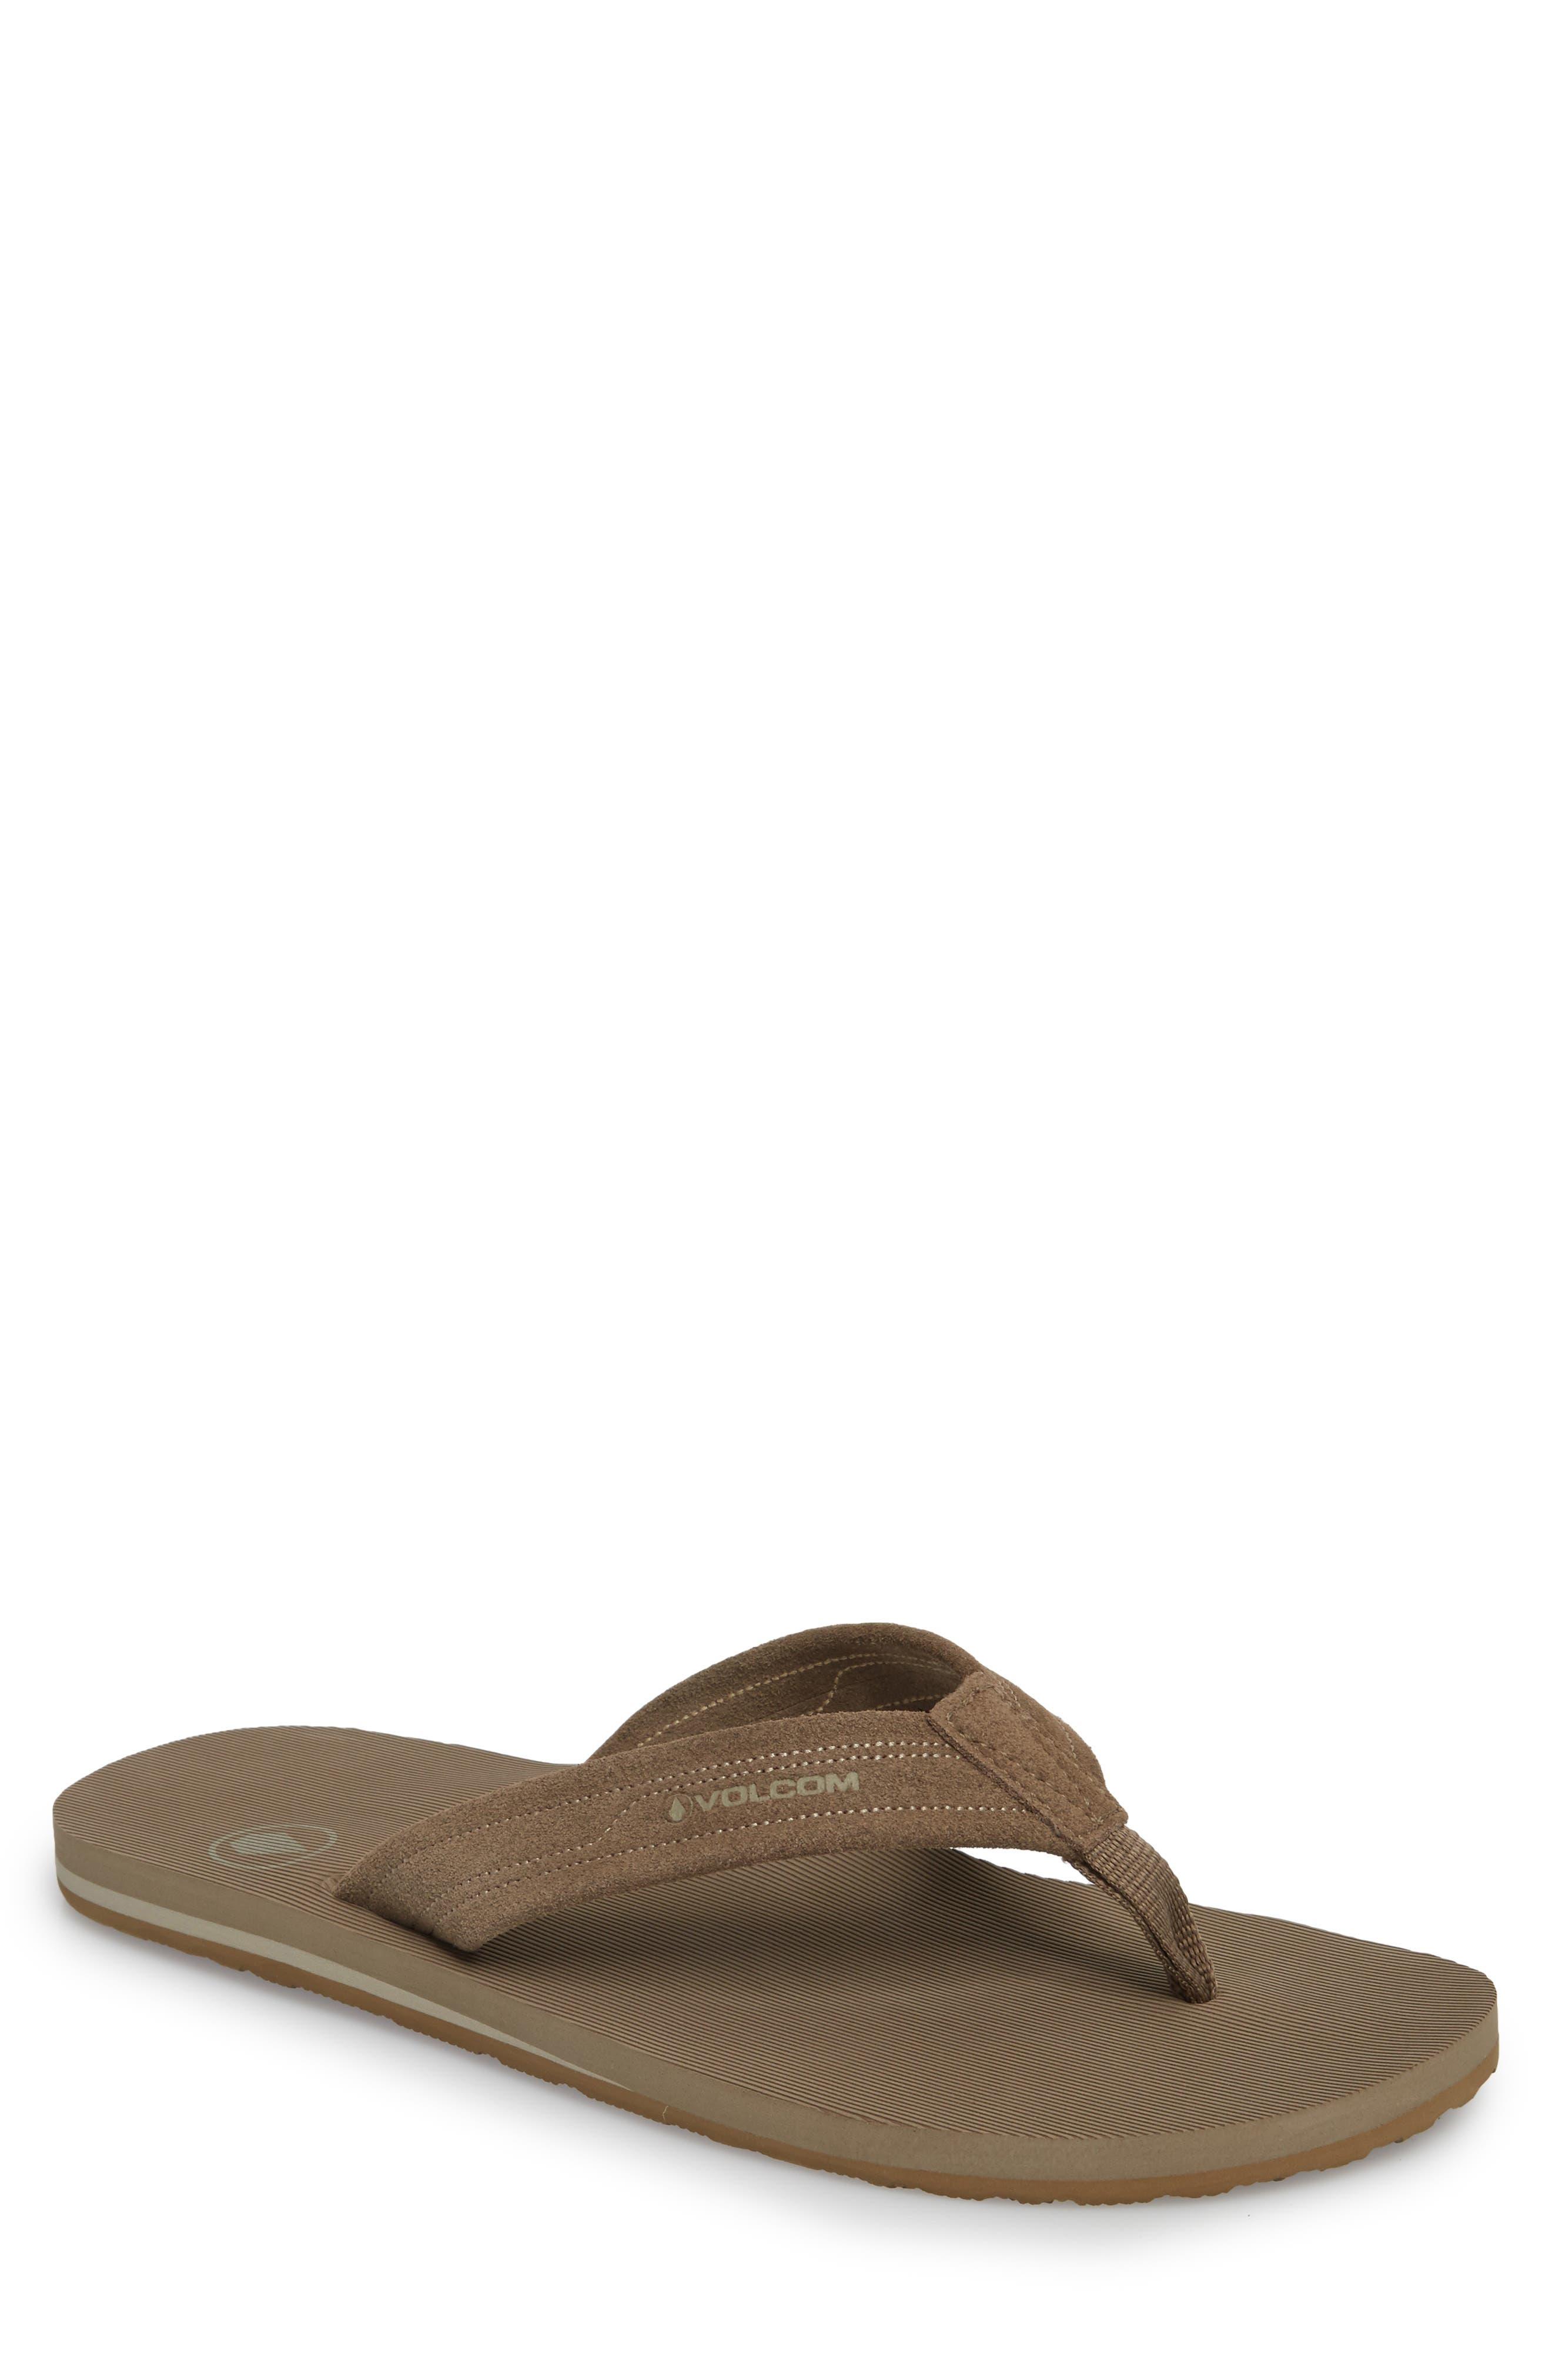 Driften Flip Flop,                         Main,                         color, Tan